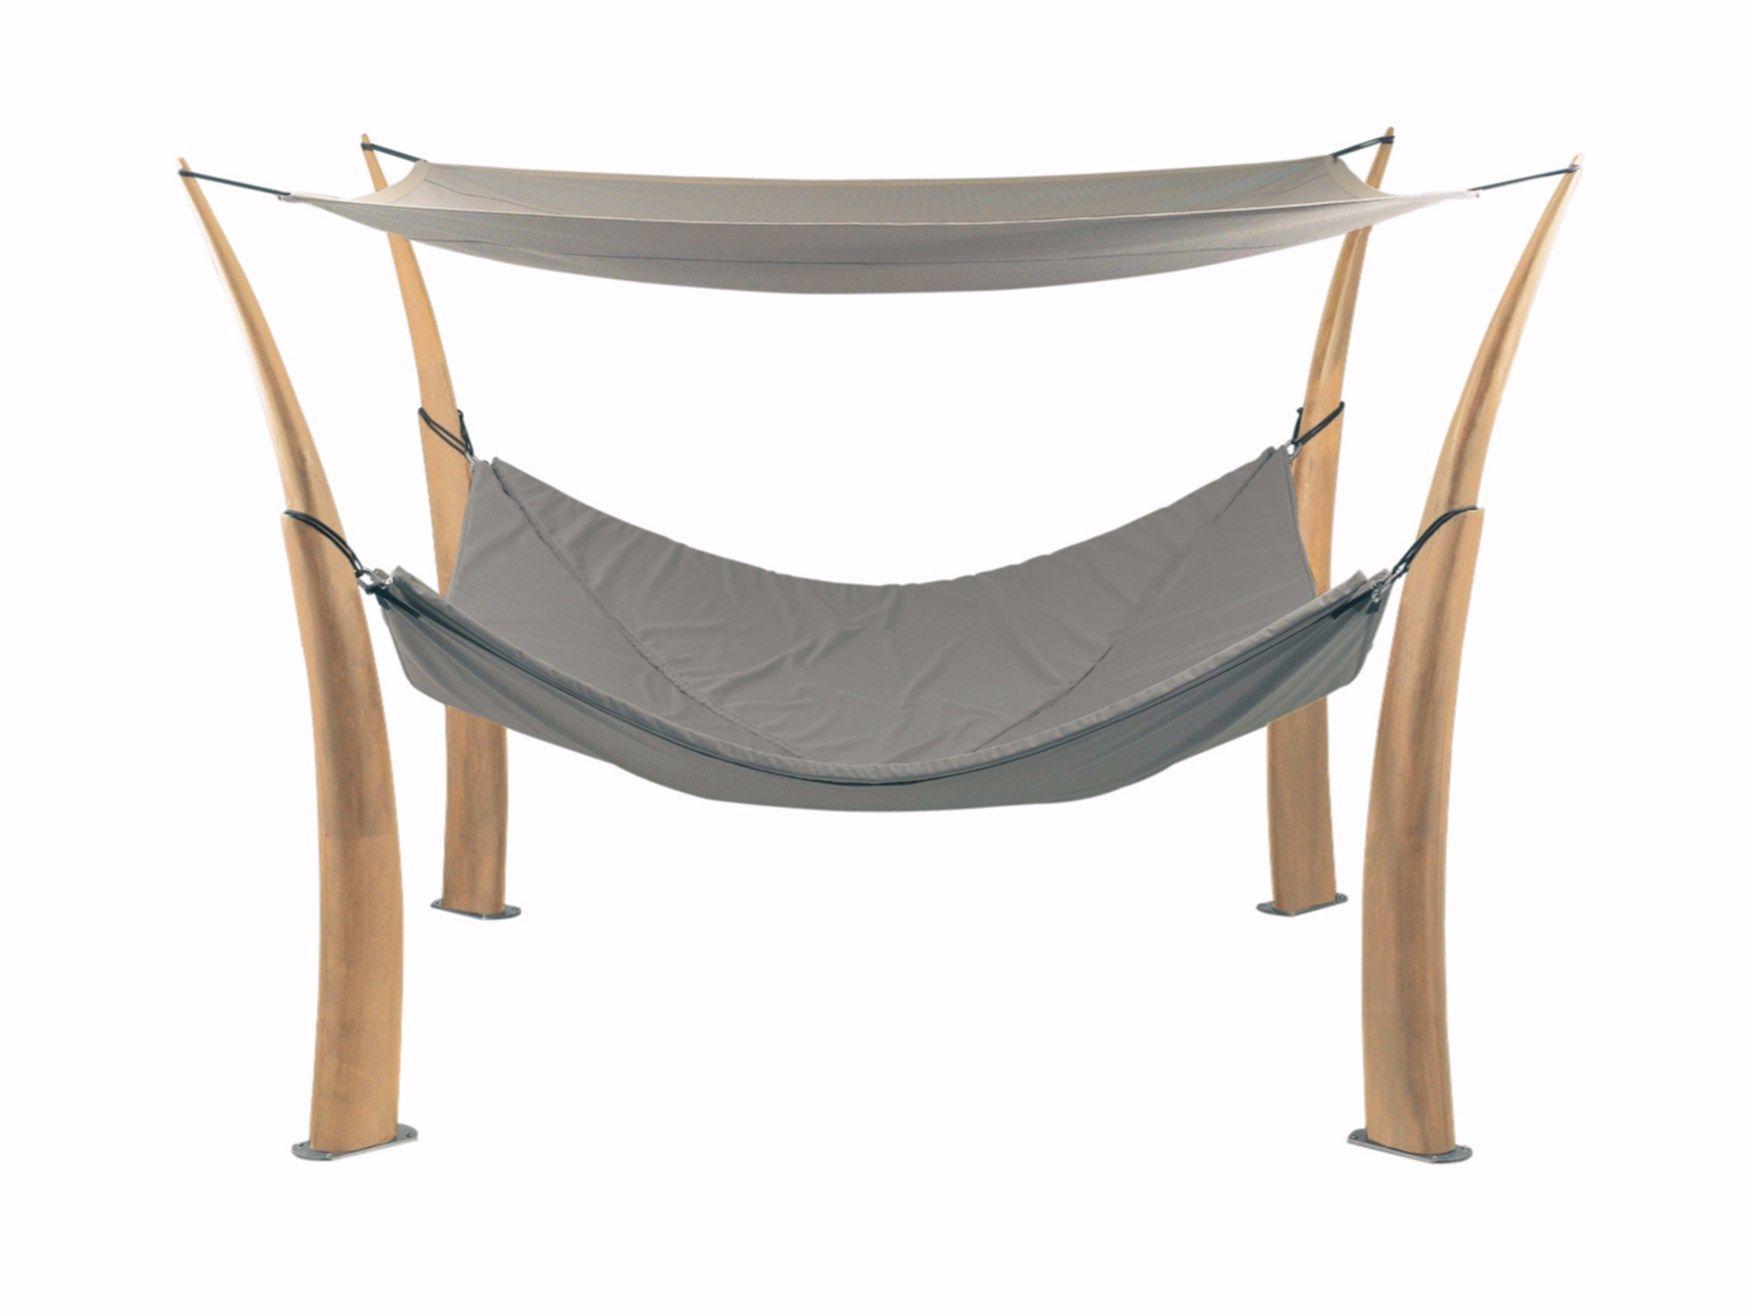 teak garden beds | archiproducts, Attraktive mobel